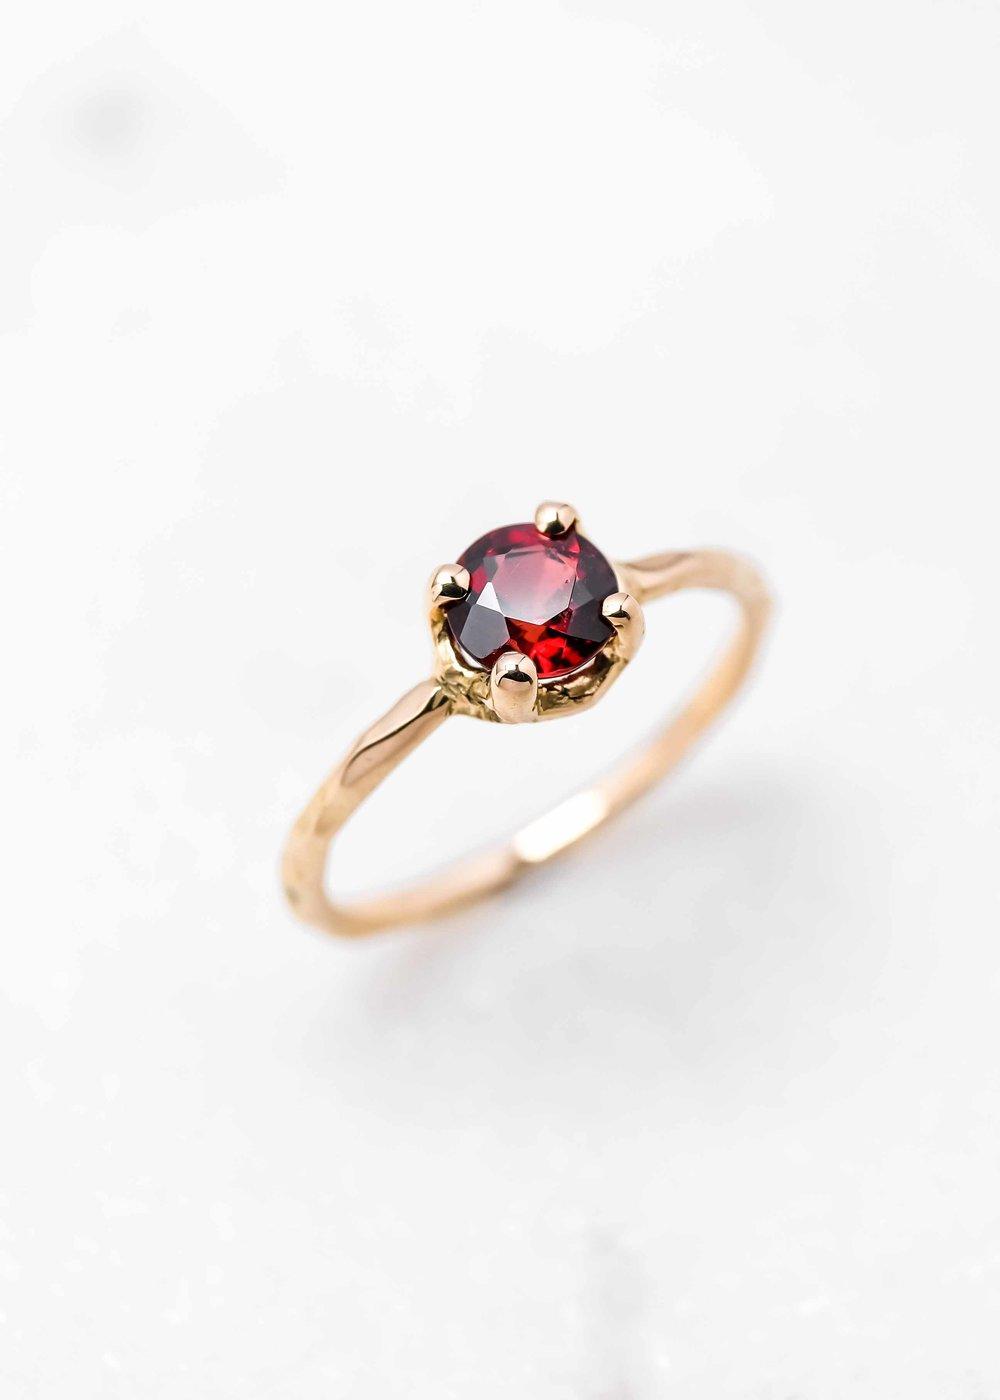 jewelry-wedding-ring-gold-grenat-the-black-alchemy-3.jpg